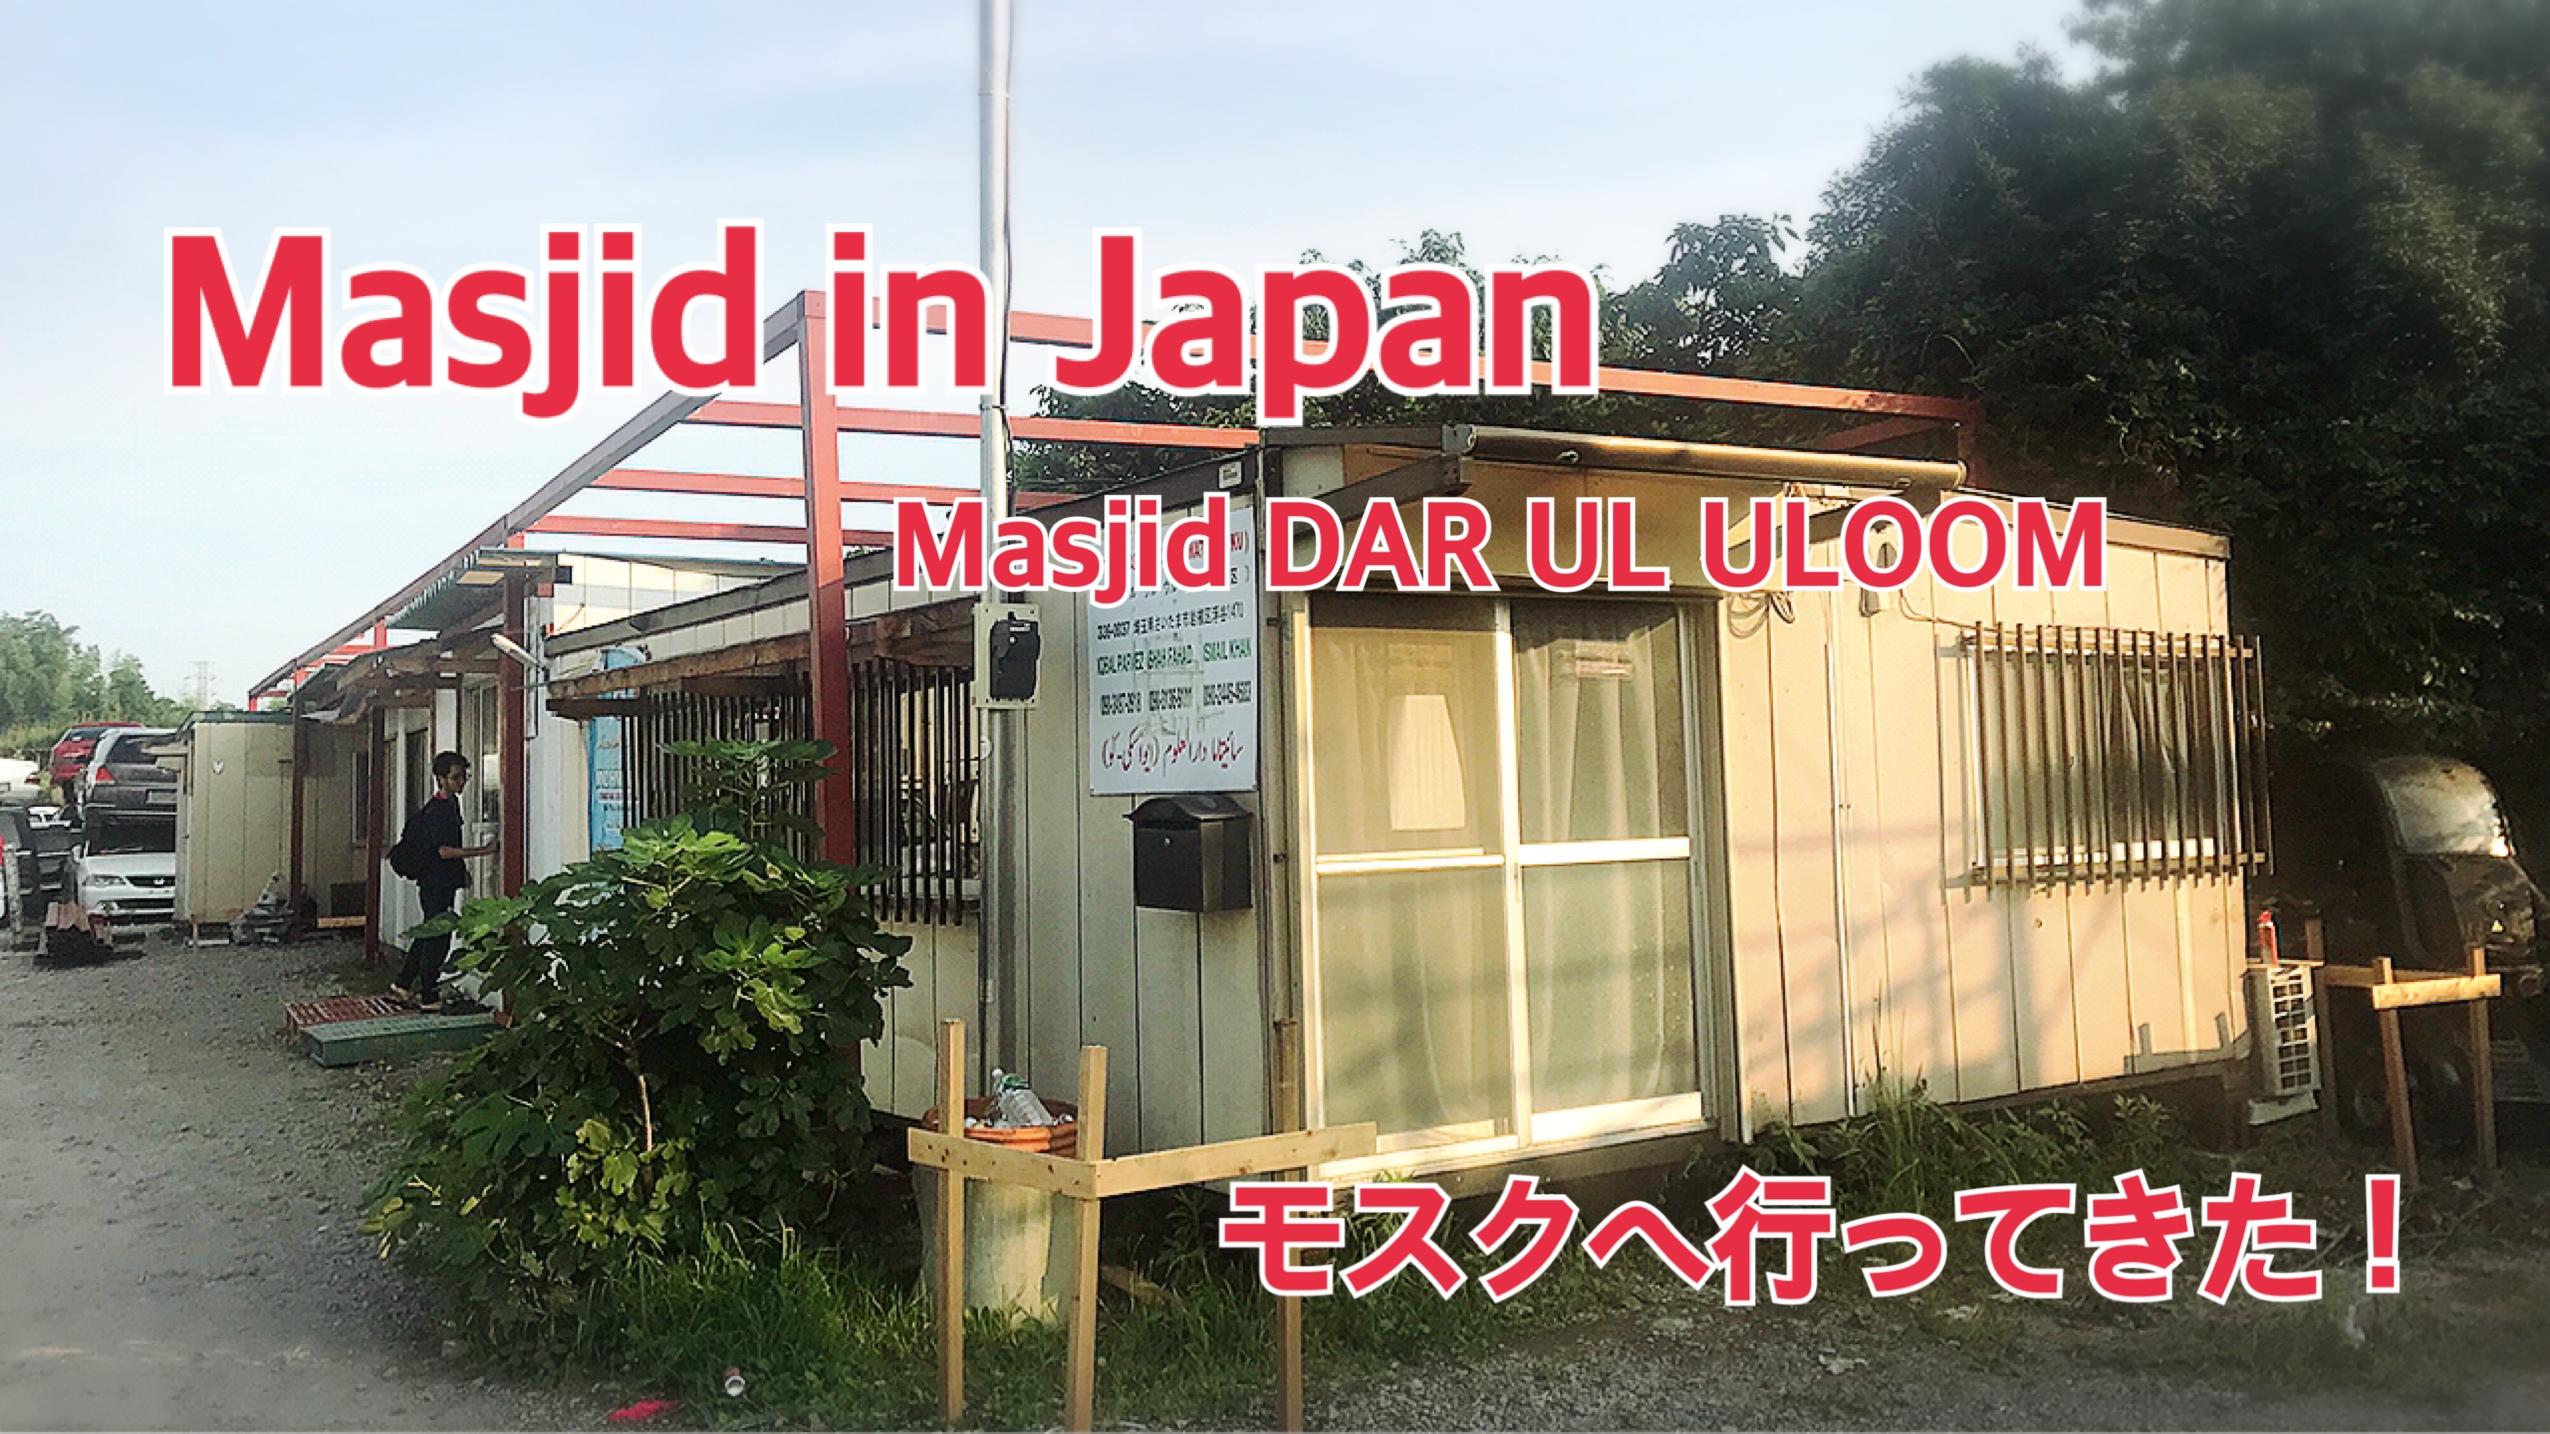 "Masjid in Japan ""Masjid DAR UL ULOOM"" 〜information of mosque & prayer room〜"